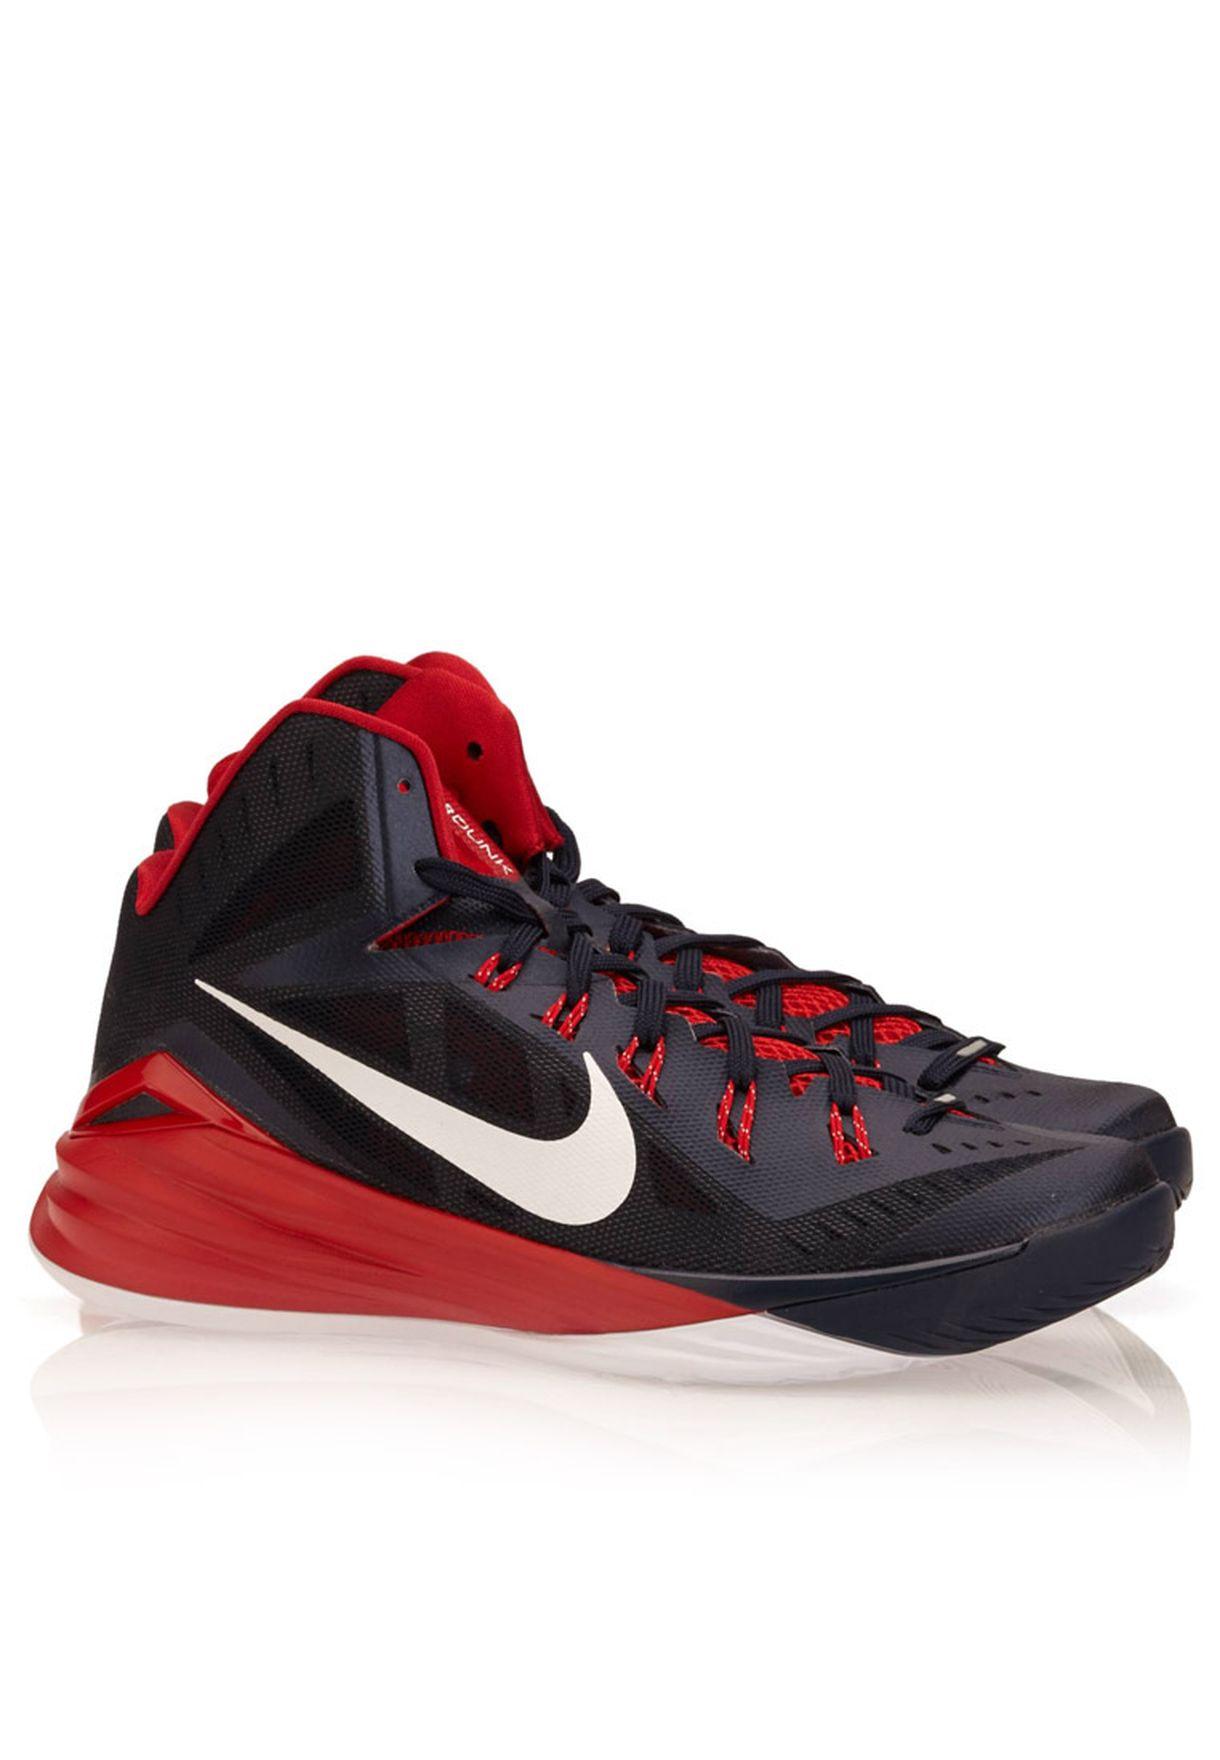 huge discount 7a129 7c9f1 Shop Nike multicolor Hyperdunk 2014 653640-416 for Men in UAE ...